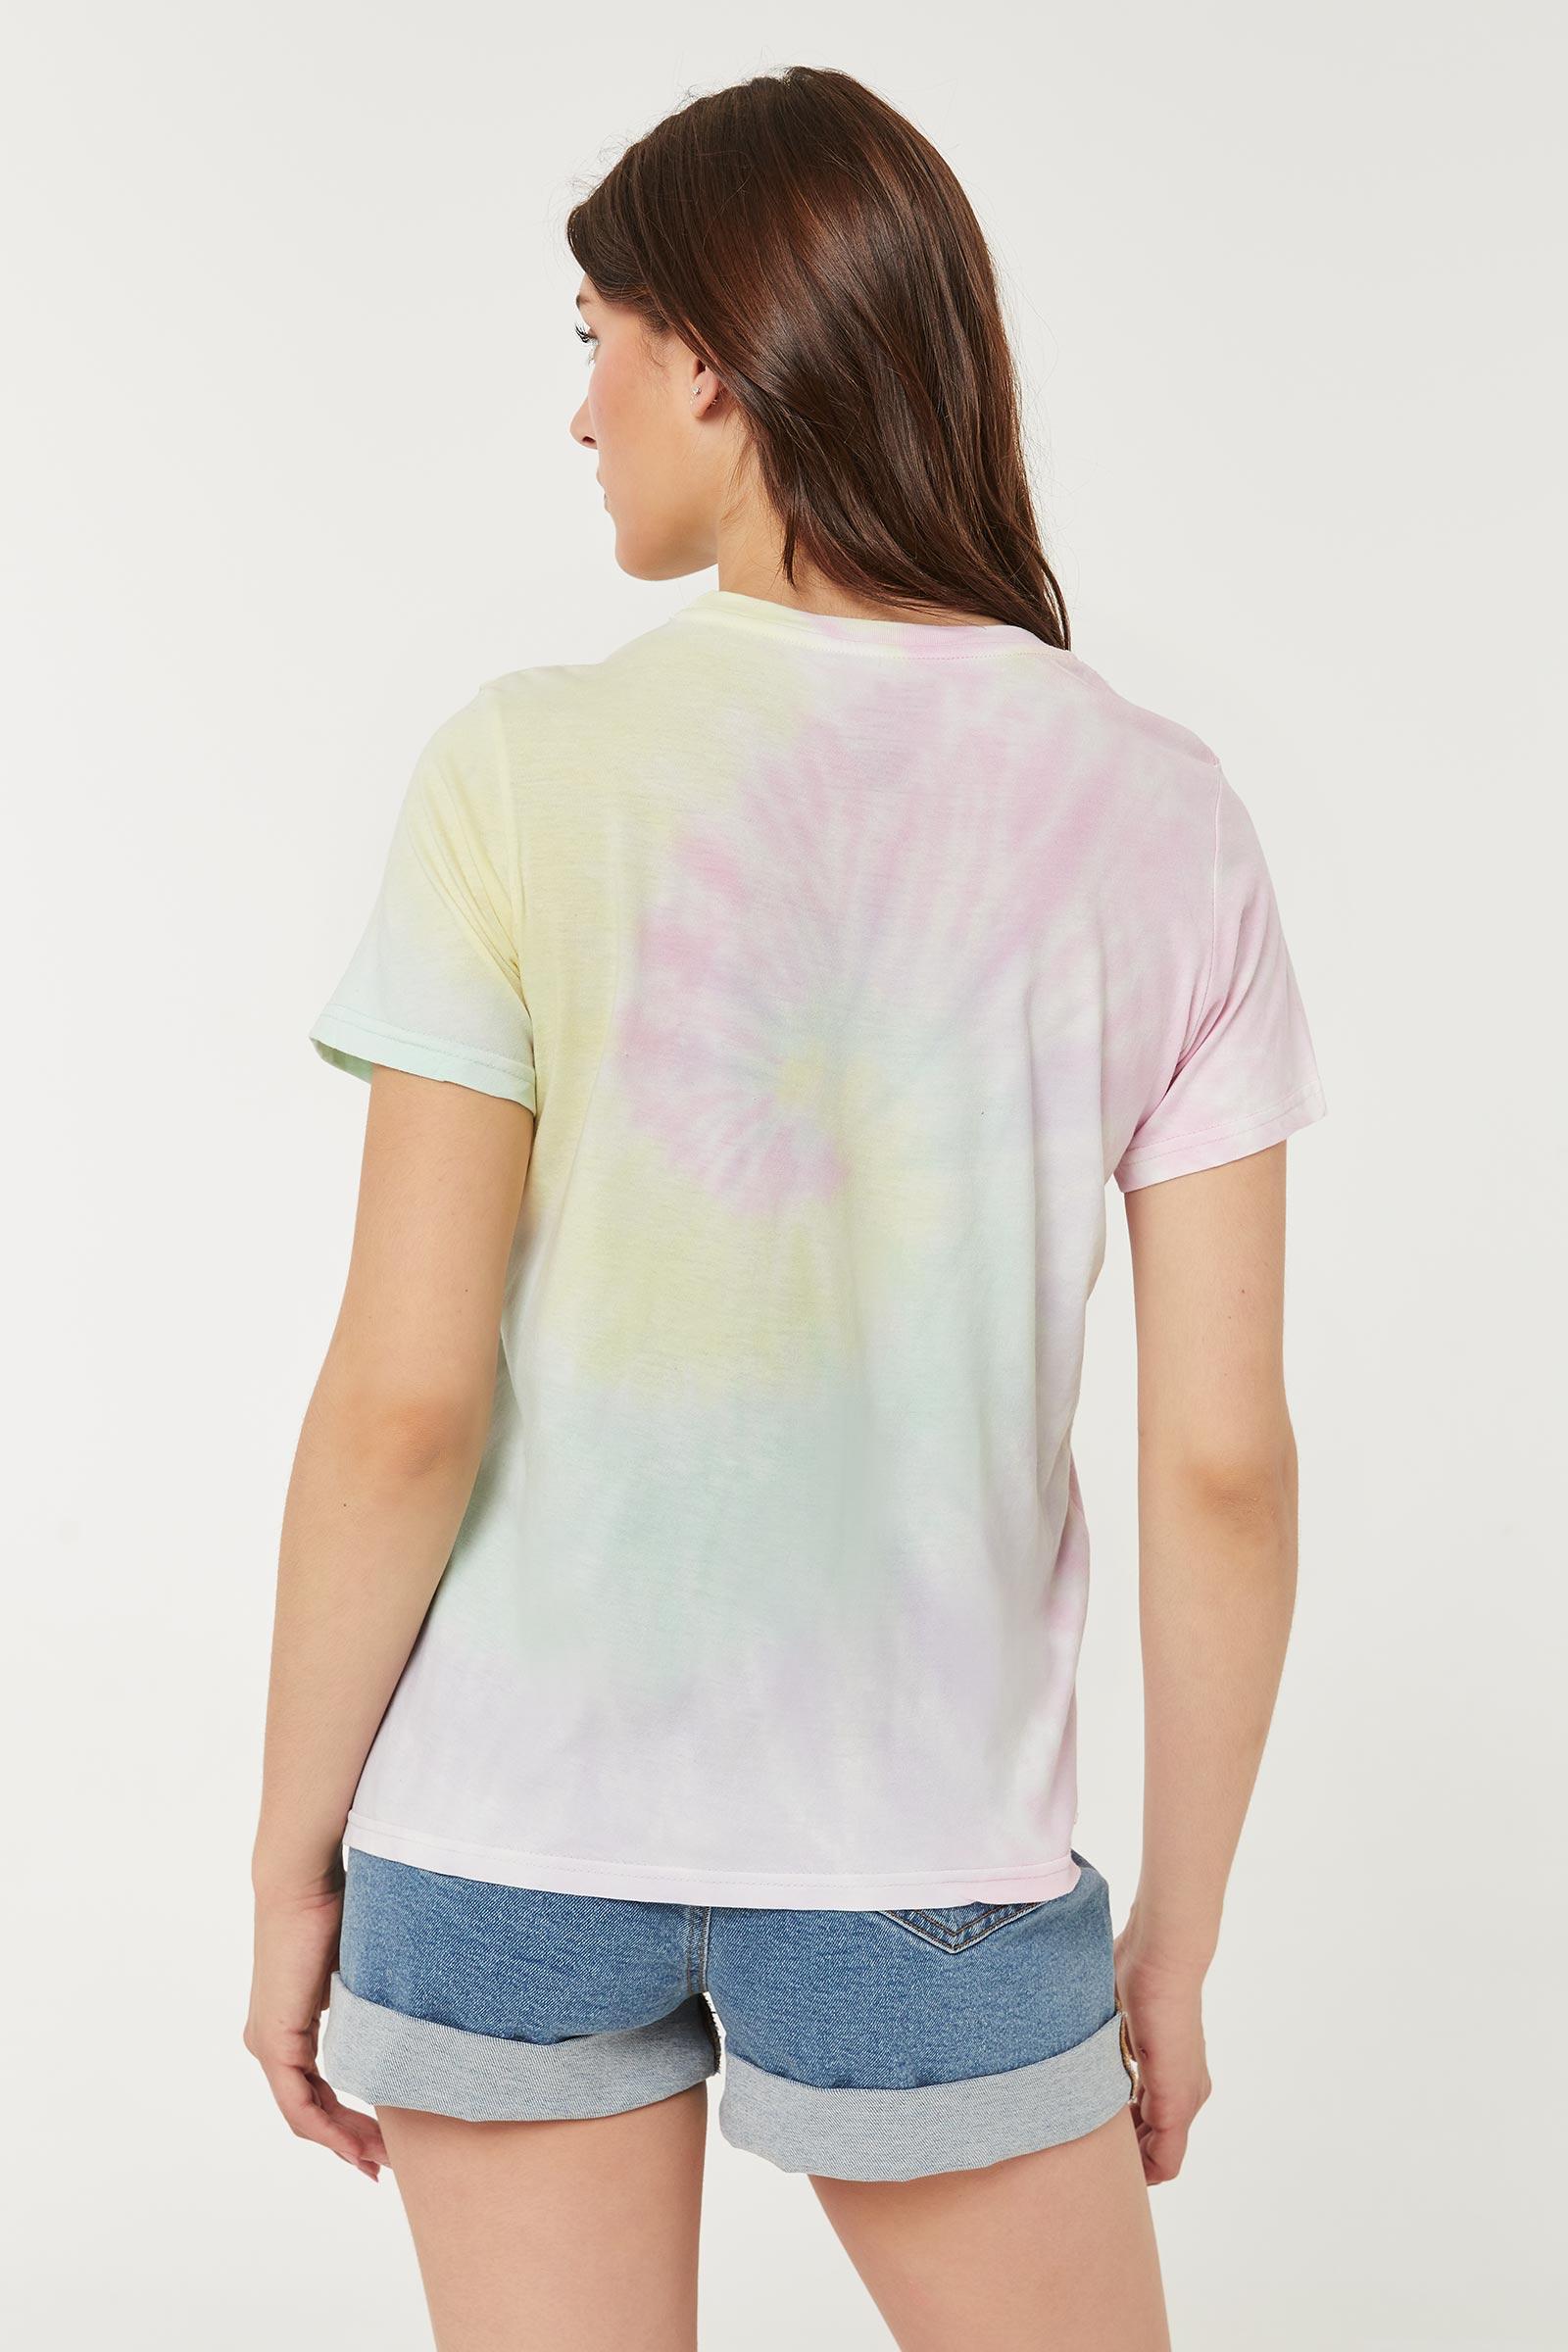 T-shirt Les Supers Nanas tie-dye